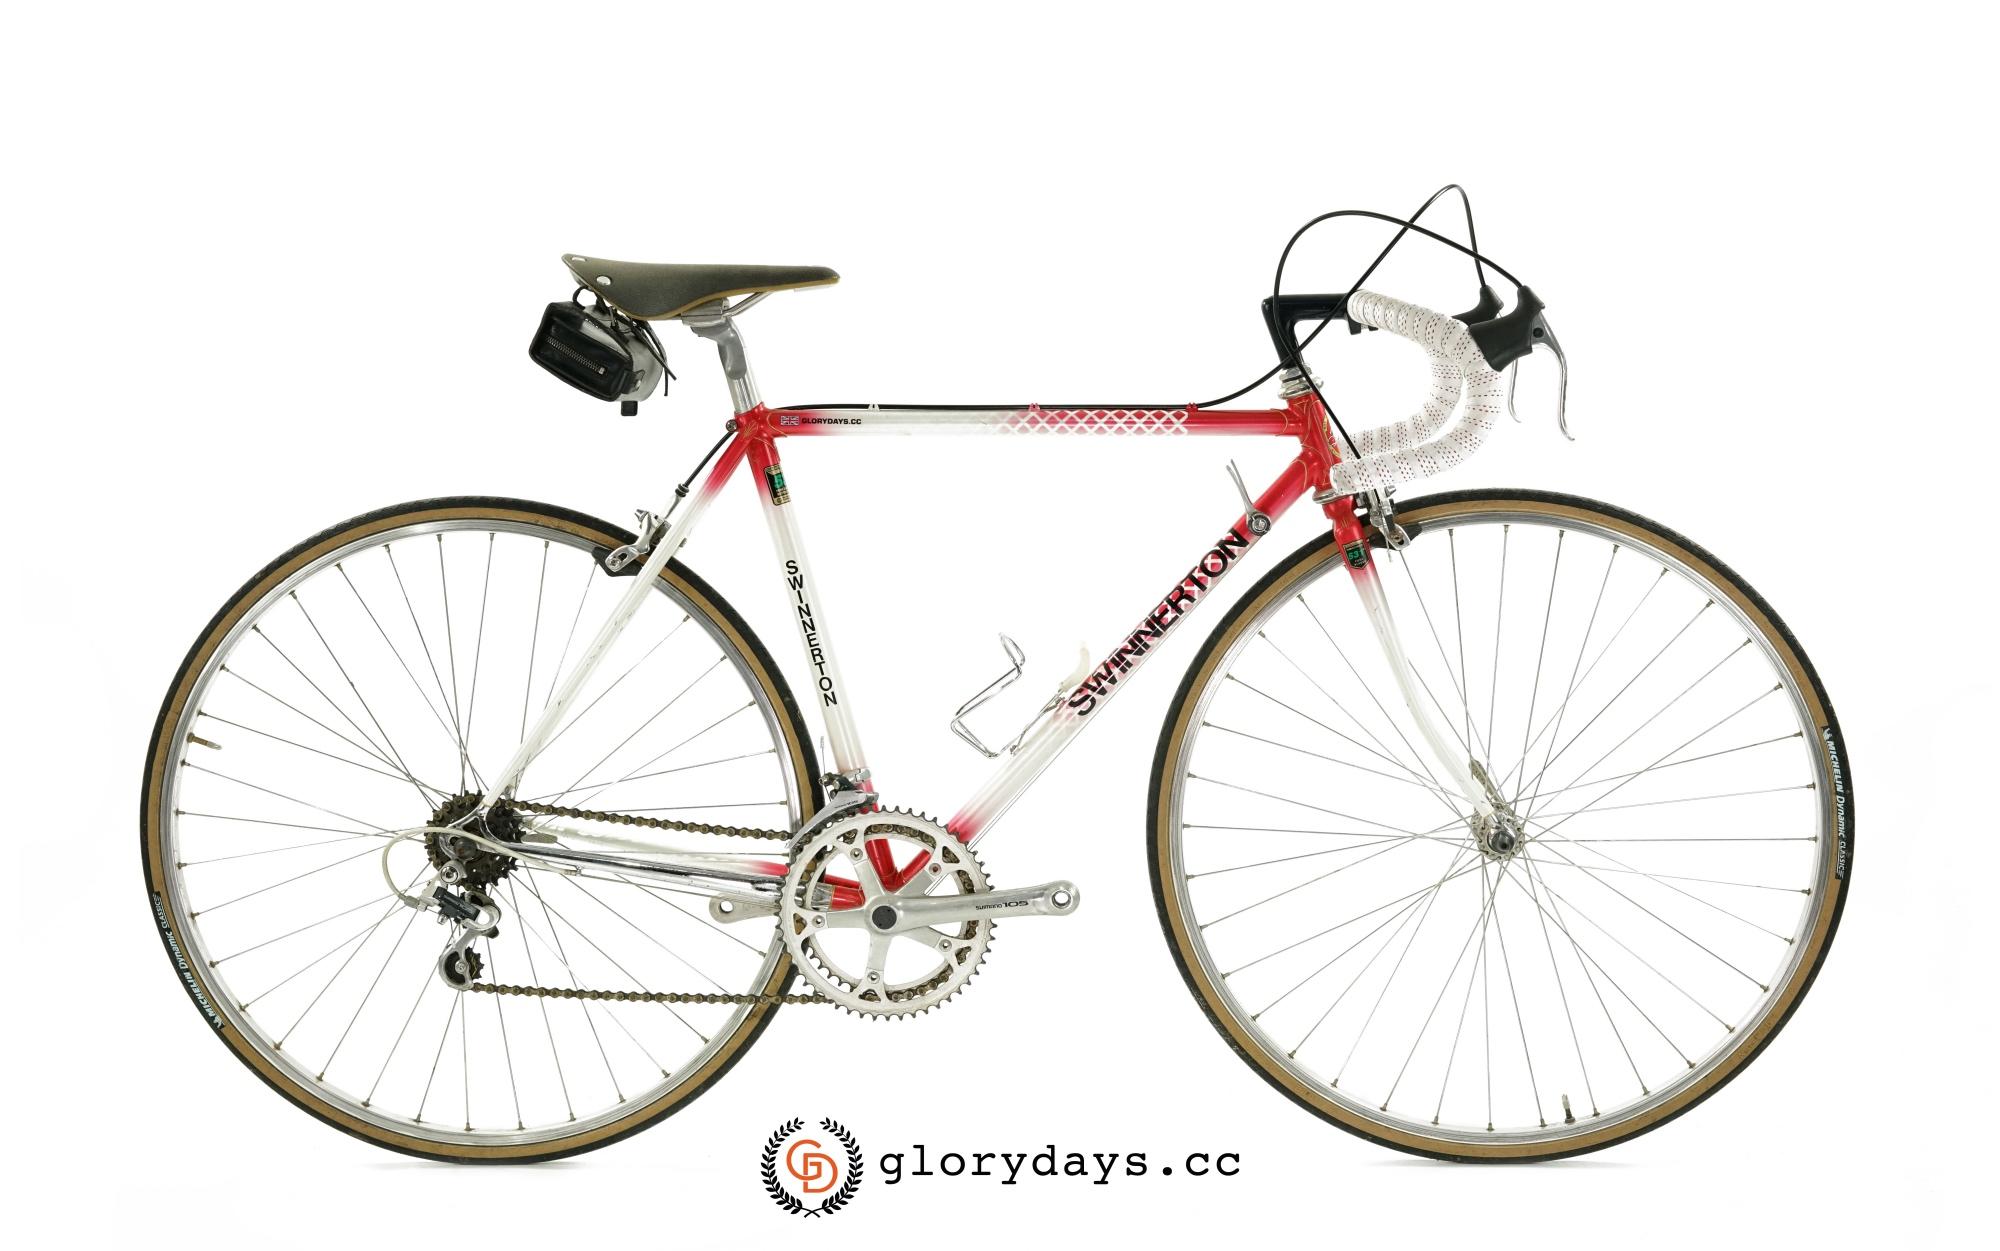 Vintage Swinnerton bicycle - Glory Days Bikes